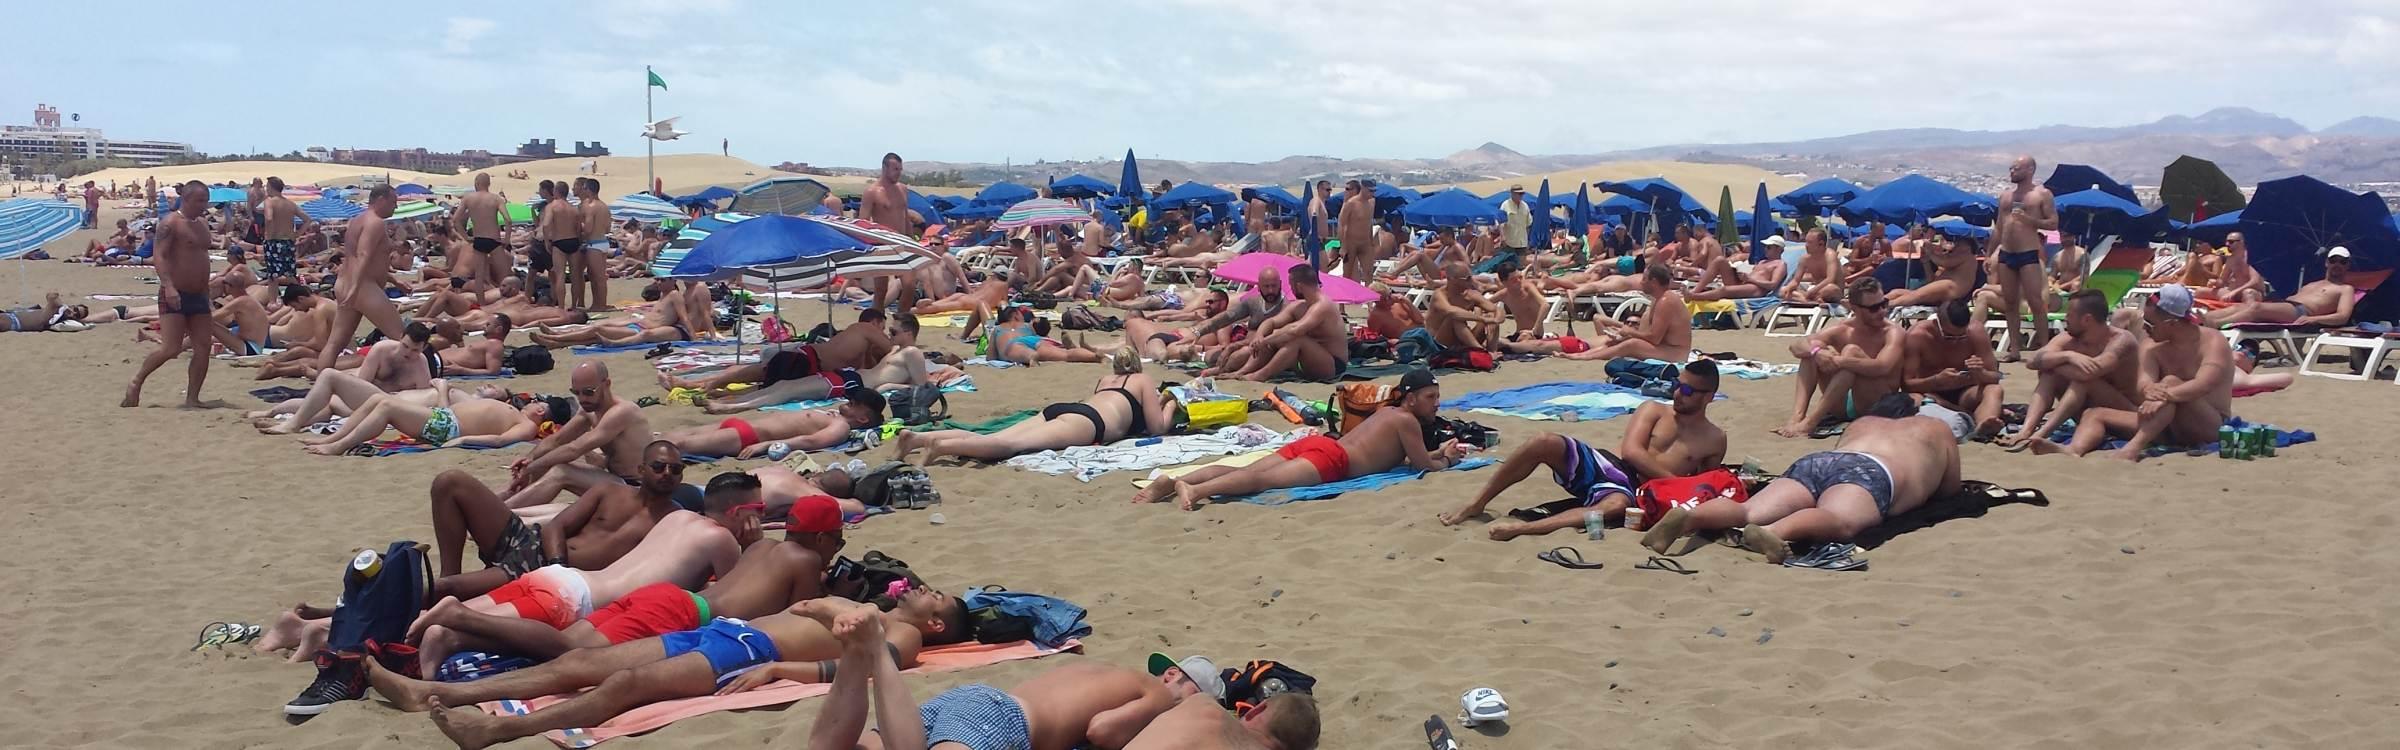 Playa Del Ingles Gay 99